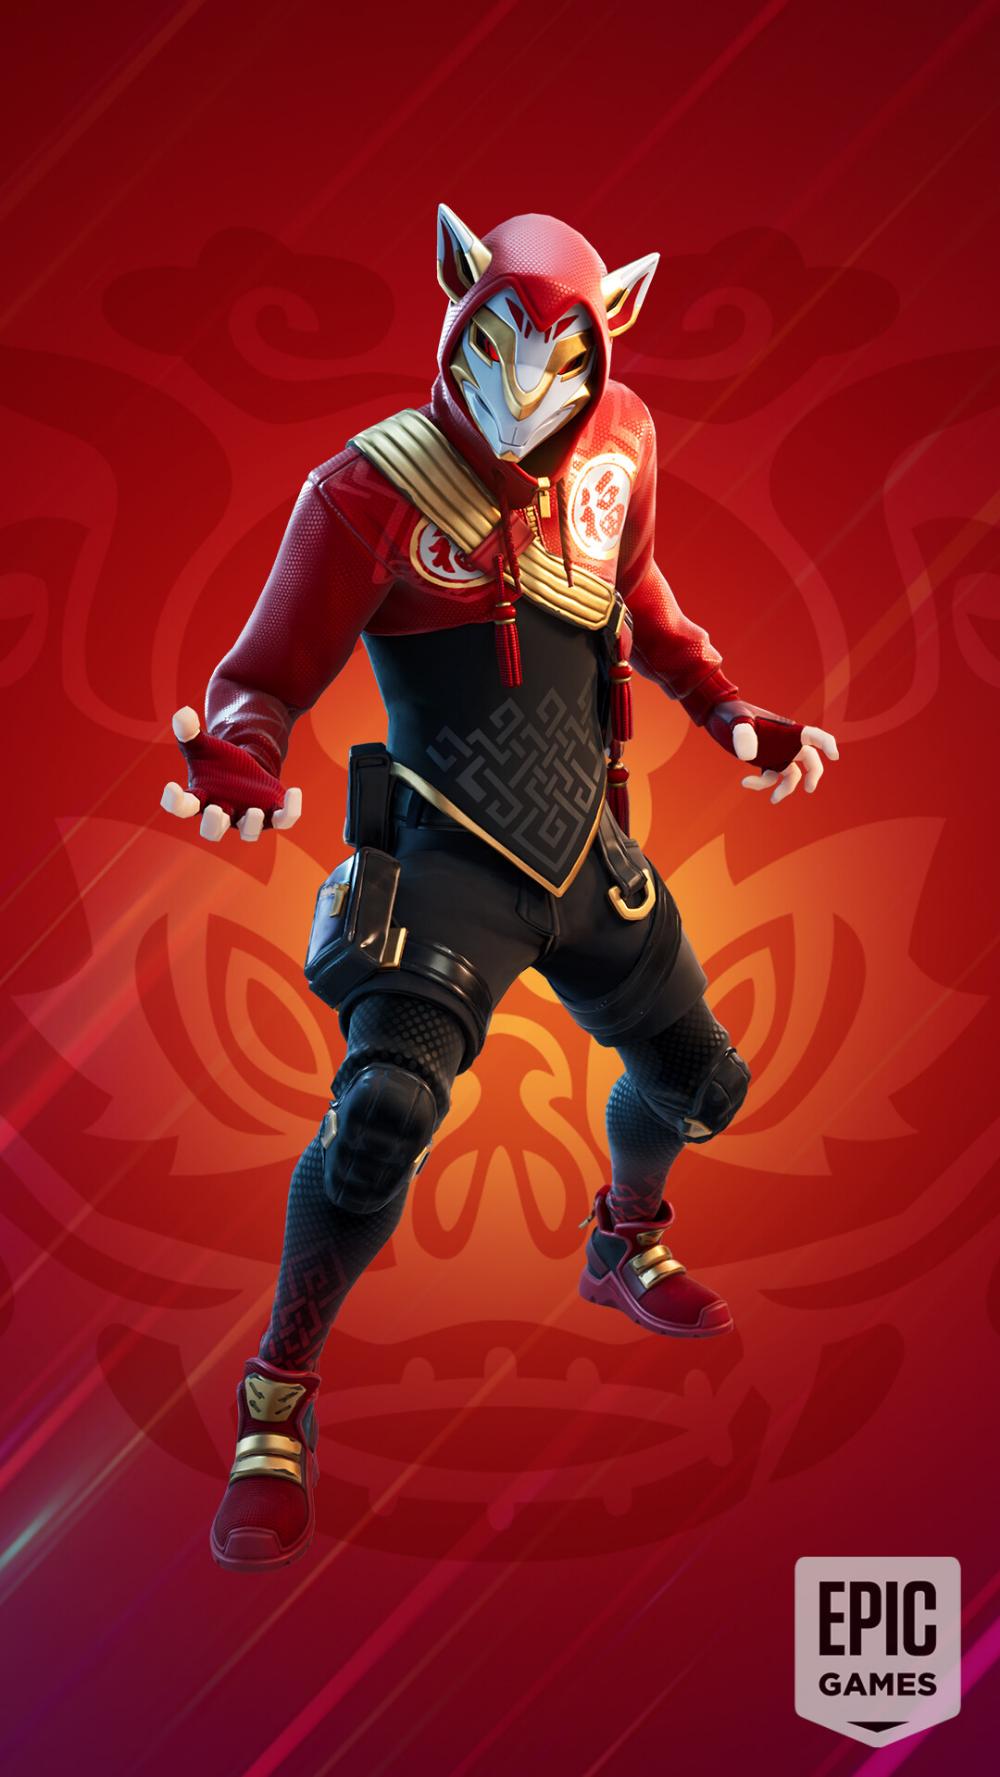 Artstation Fortnite Swift Character Skin Justin Holt In 2020 Fortnite Best Gaming Wallpapers Character Wallpaper